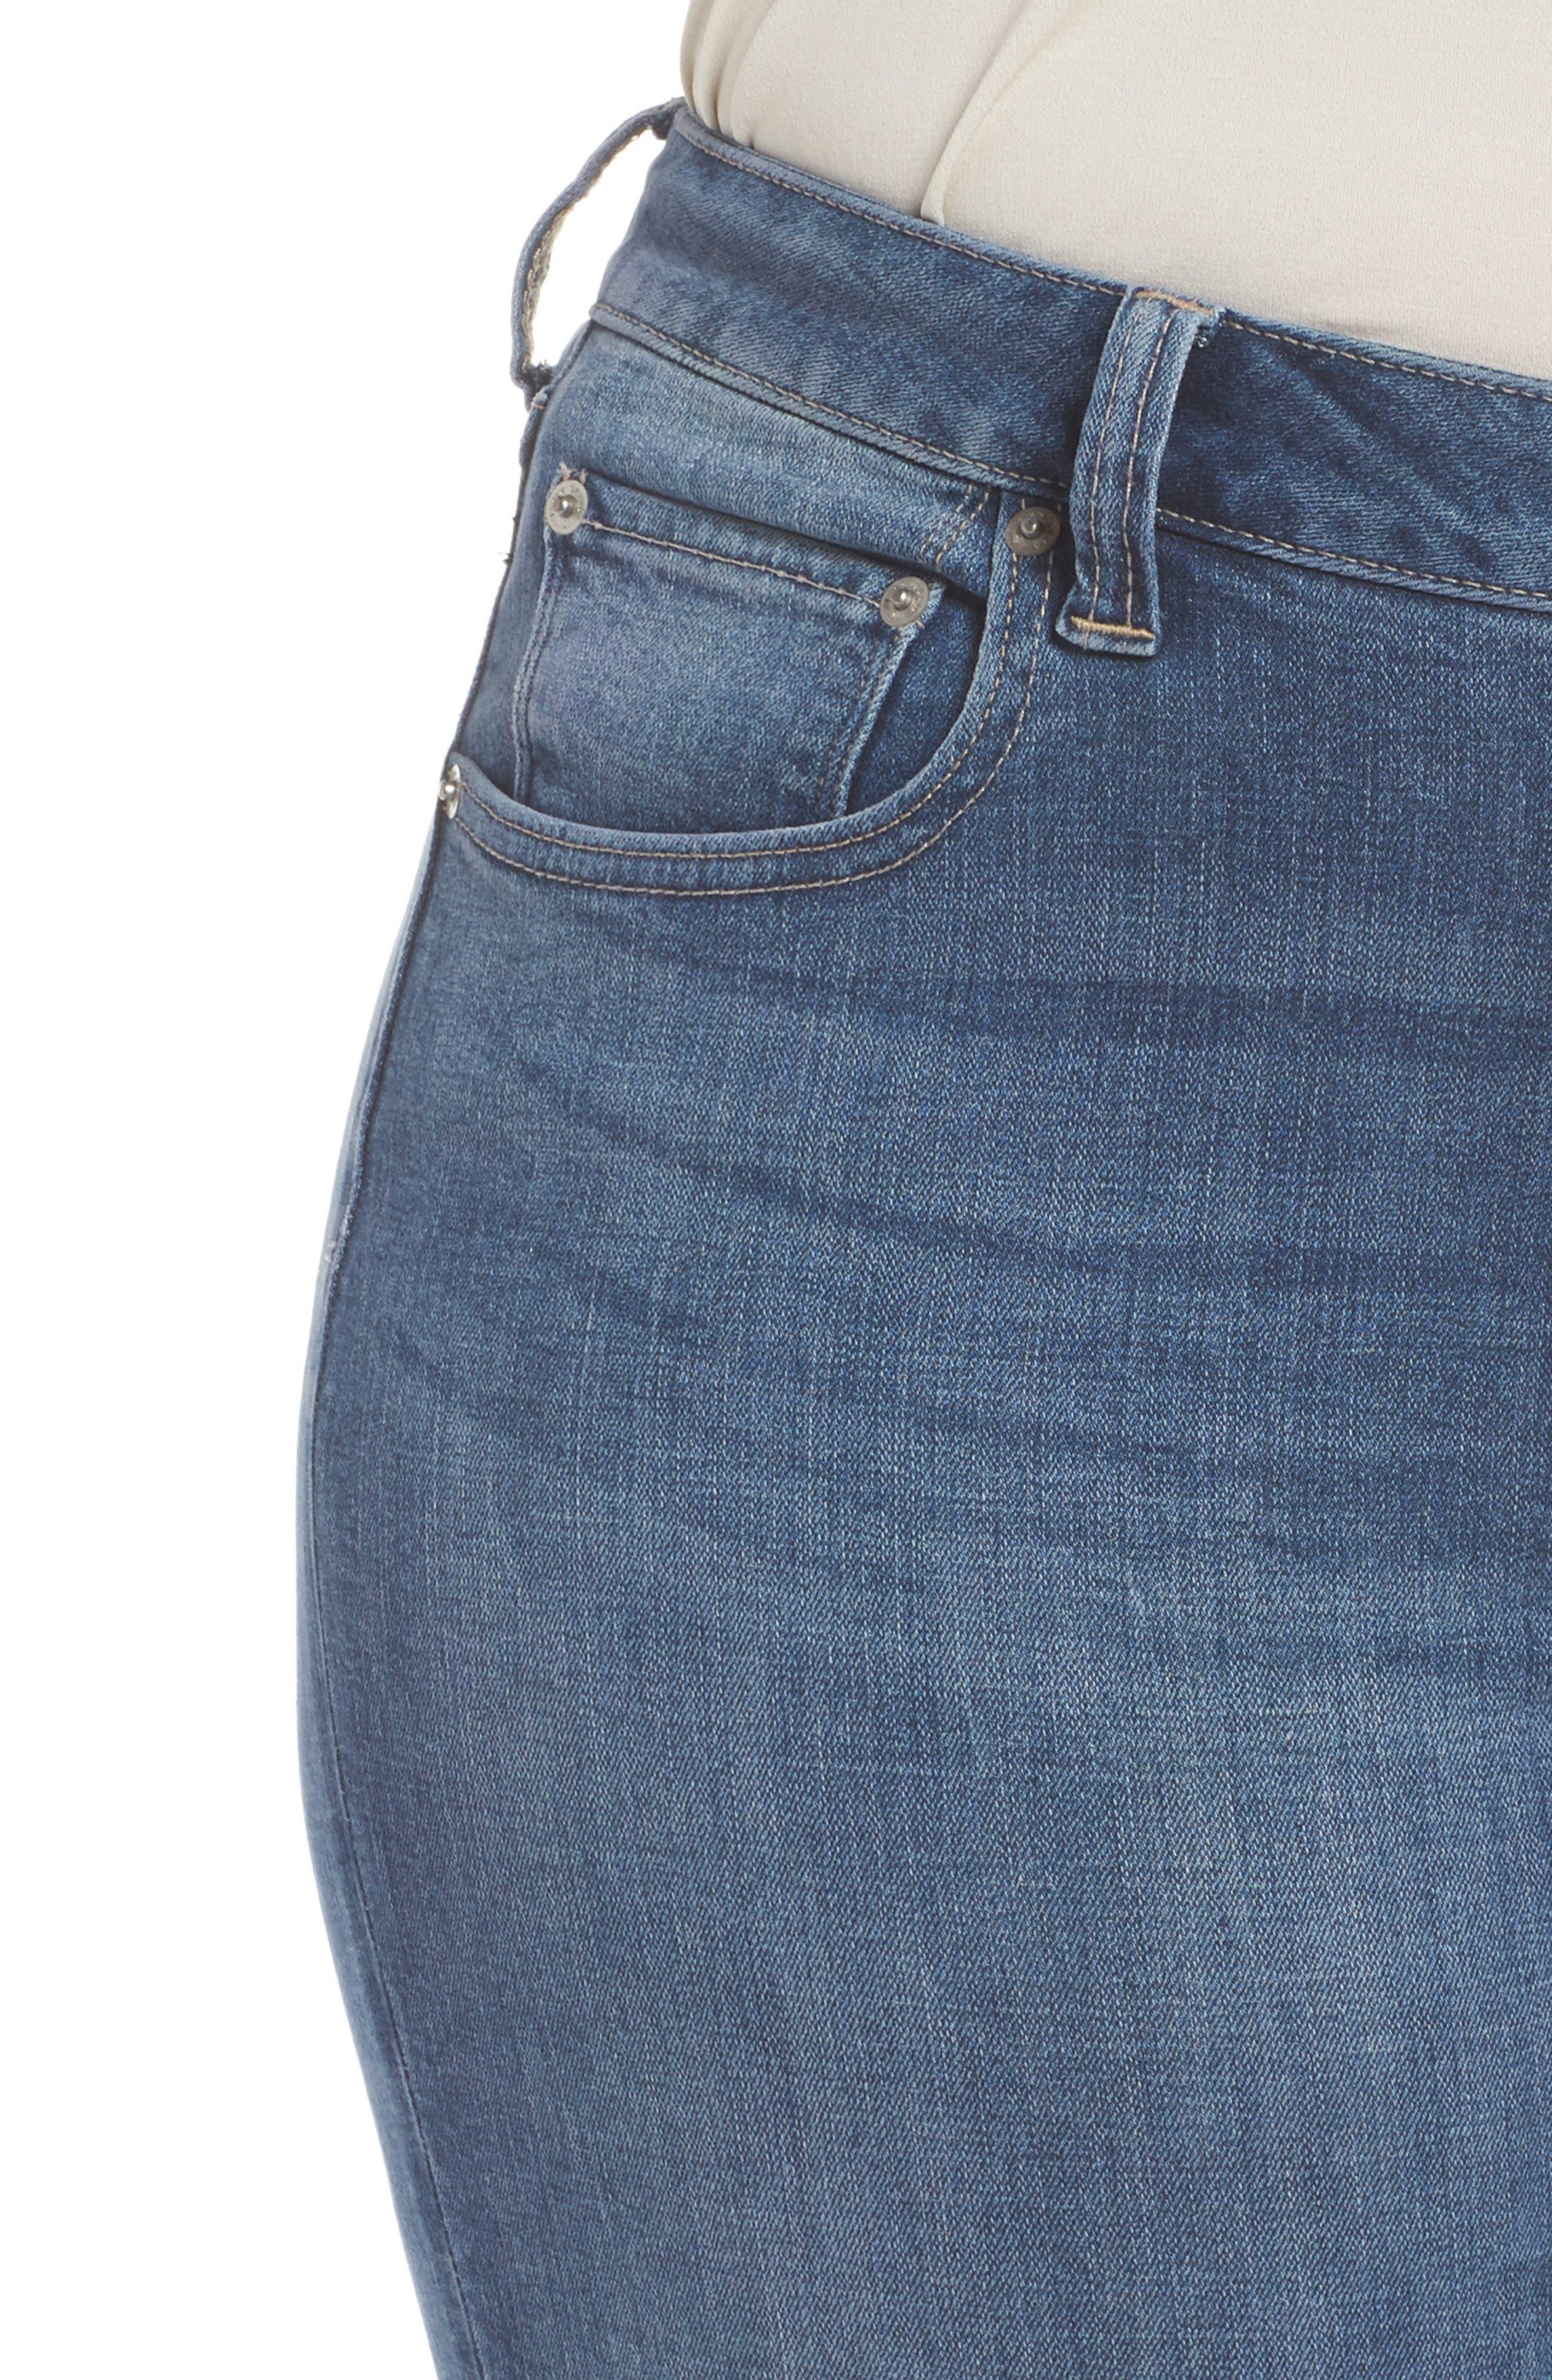 Emma Crop Skinny Jeans,                             Alternate thumbnail 4, color,                             Sunbeam-P